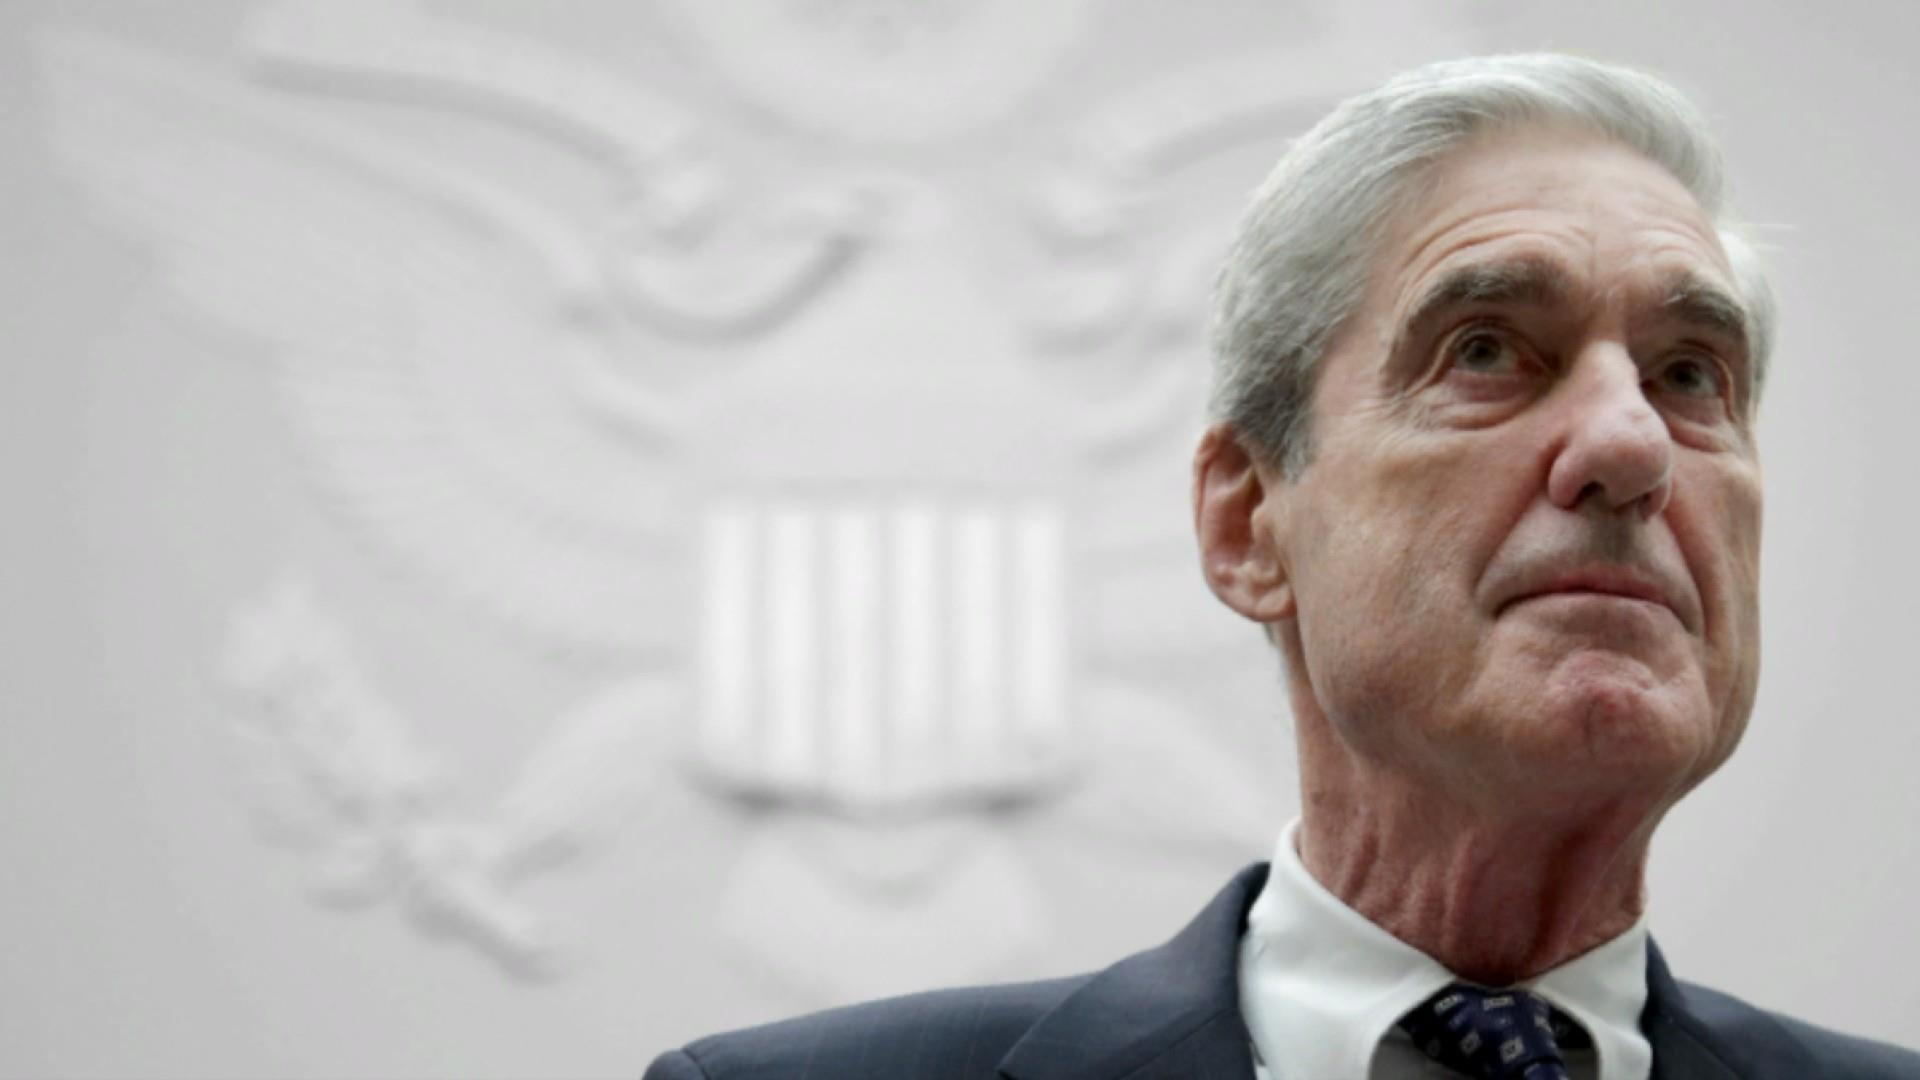 Trump celebrates after subdued Mueller testimony despite several damning moments